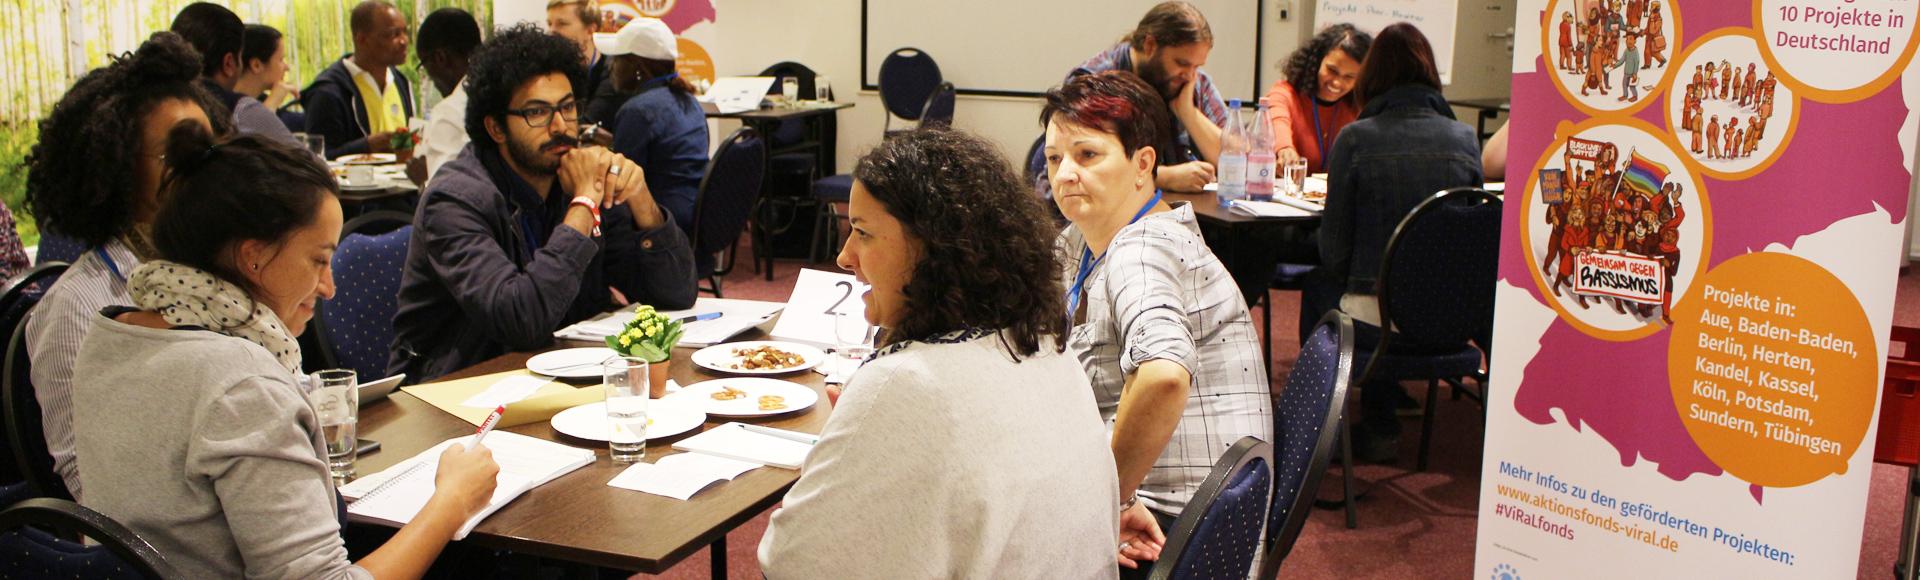 Kick-Off Meeting #ViRaLfonds interactive session